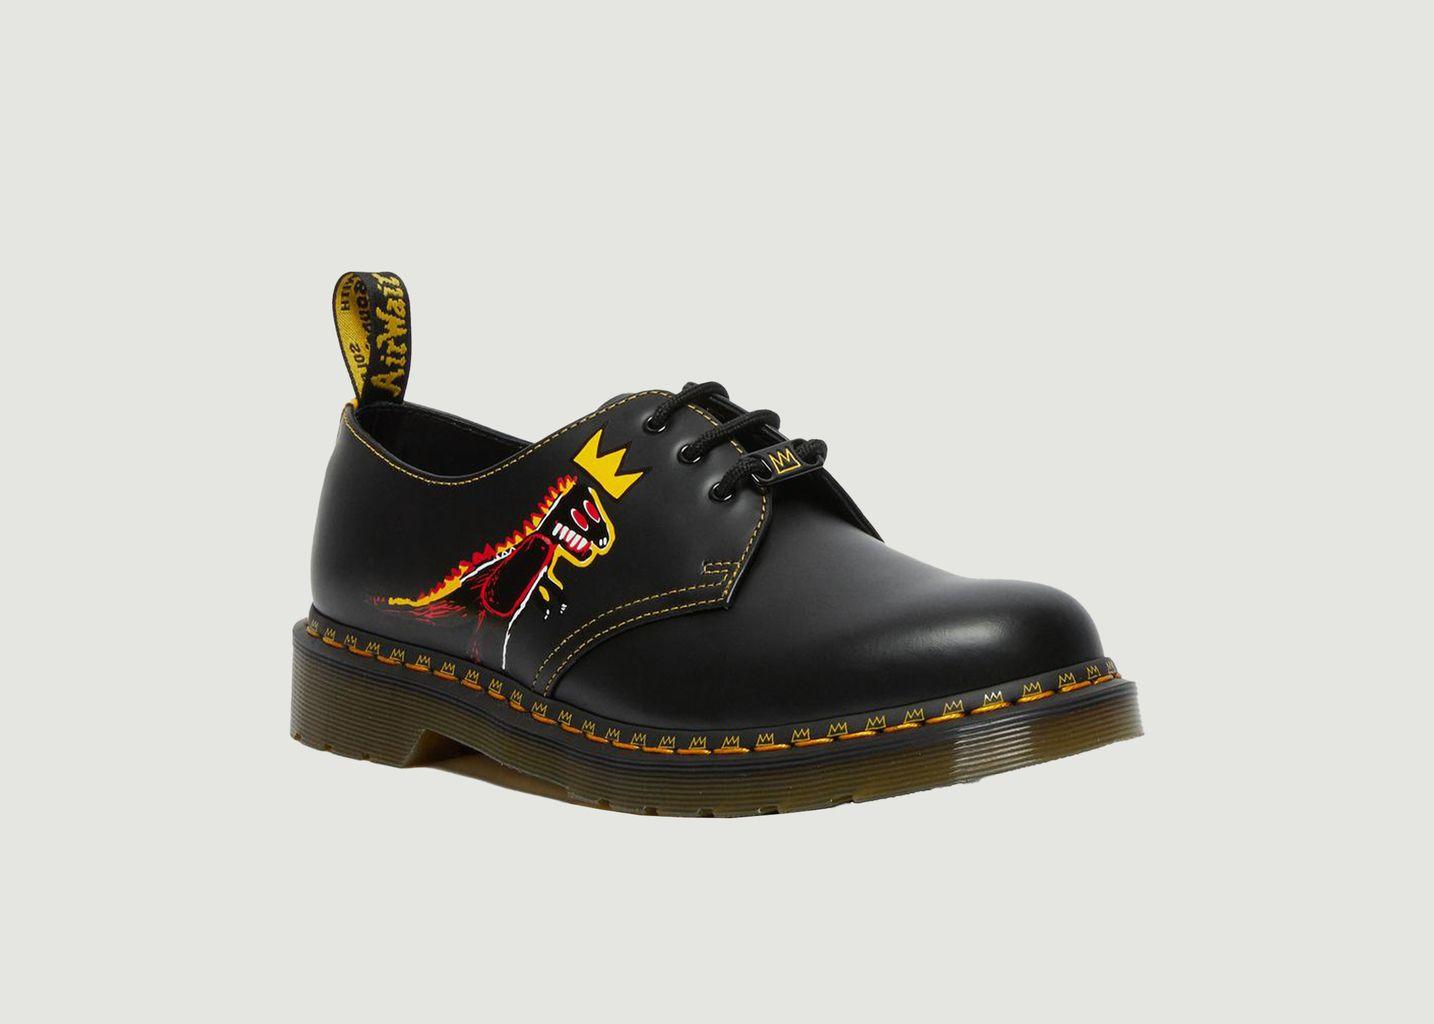 Chaussures 1461 Basquiat en cuir  - Dr. Martens